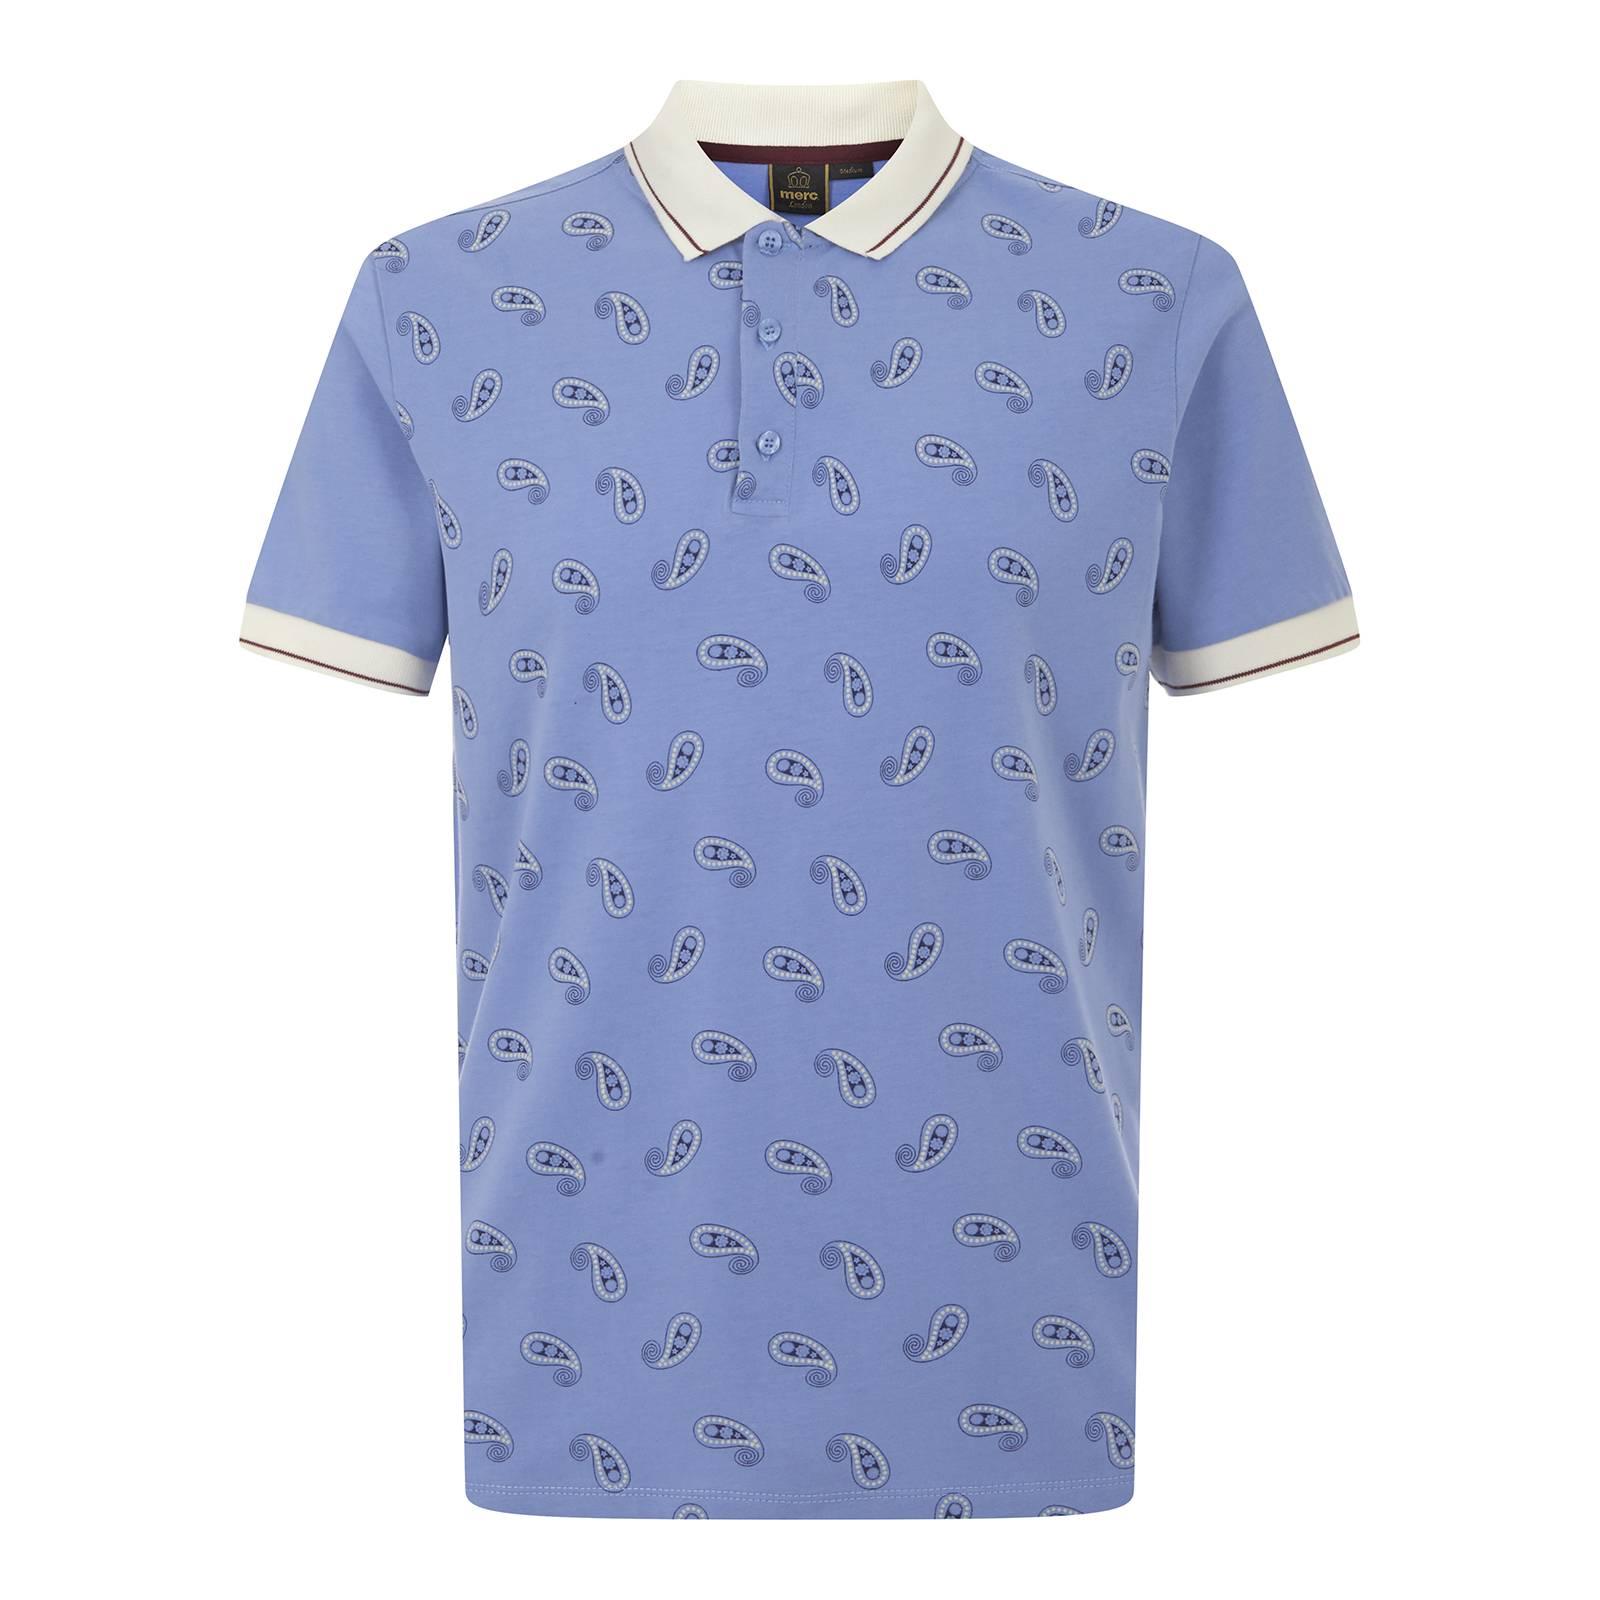 Рубашка Поло SamwellПоло<br><br><br>Артикул: 1916102<br>Материал: 100% хлопок<br>Цвет: голубой<br>Пол: Мужской